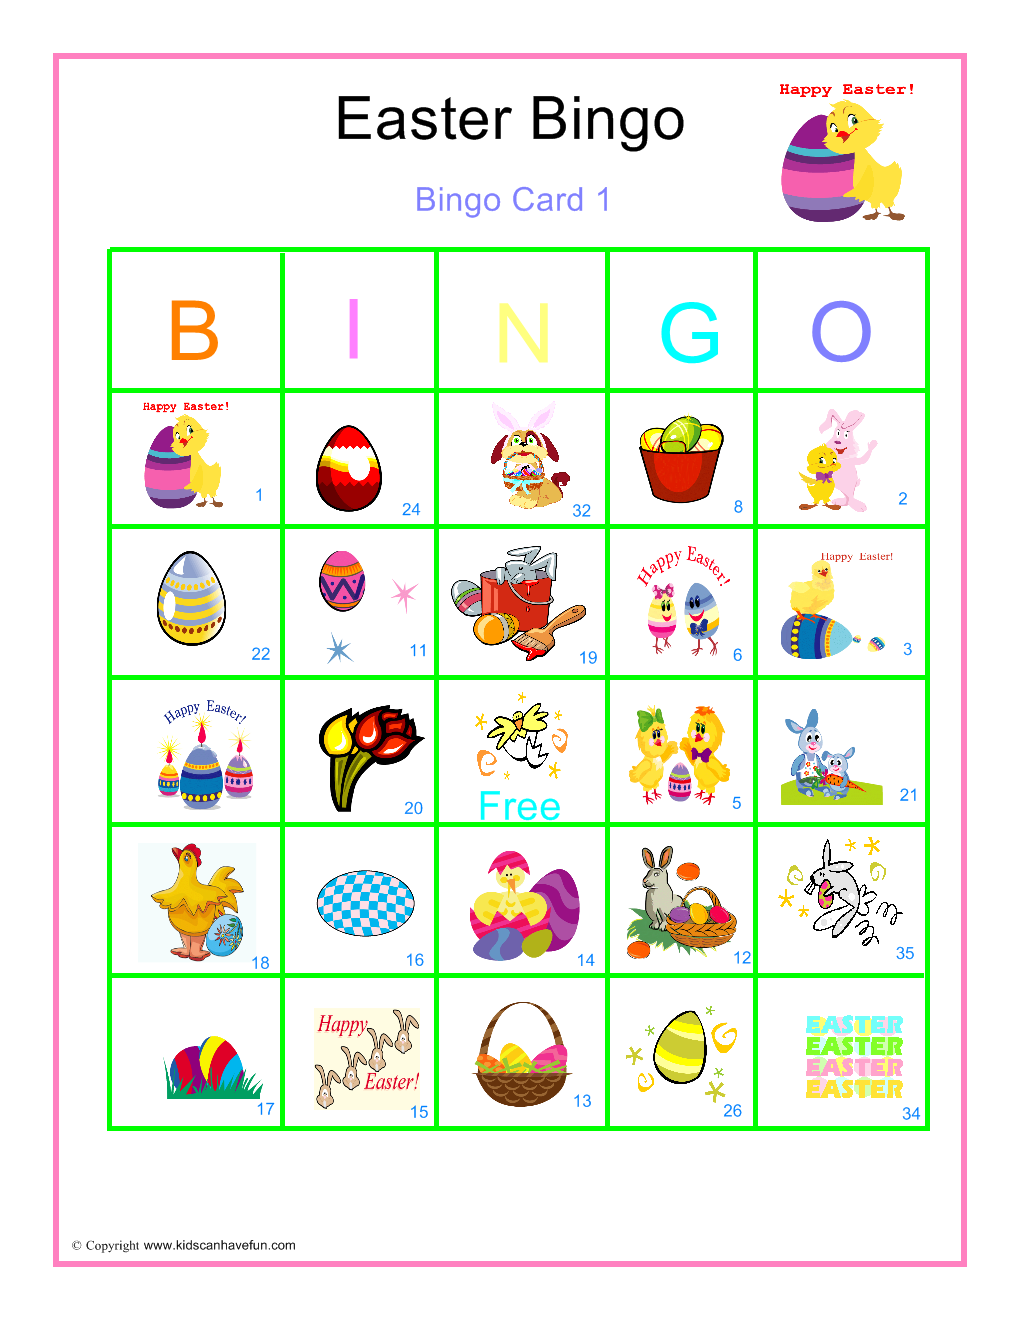 Easter Bingo Printable Cards 6 | Easter | Pinterest | Easter bingo ...